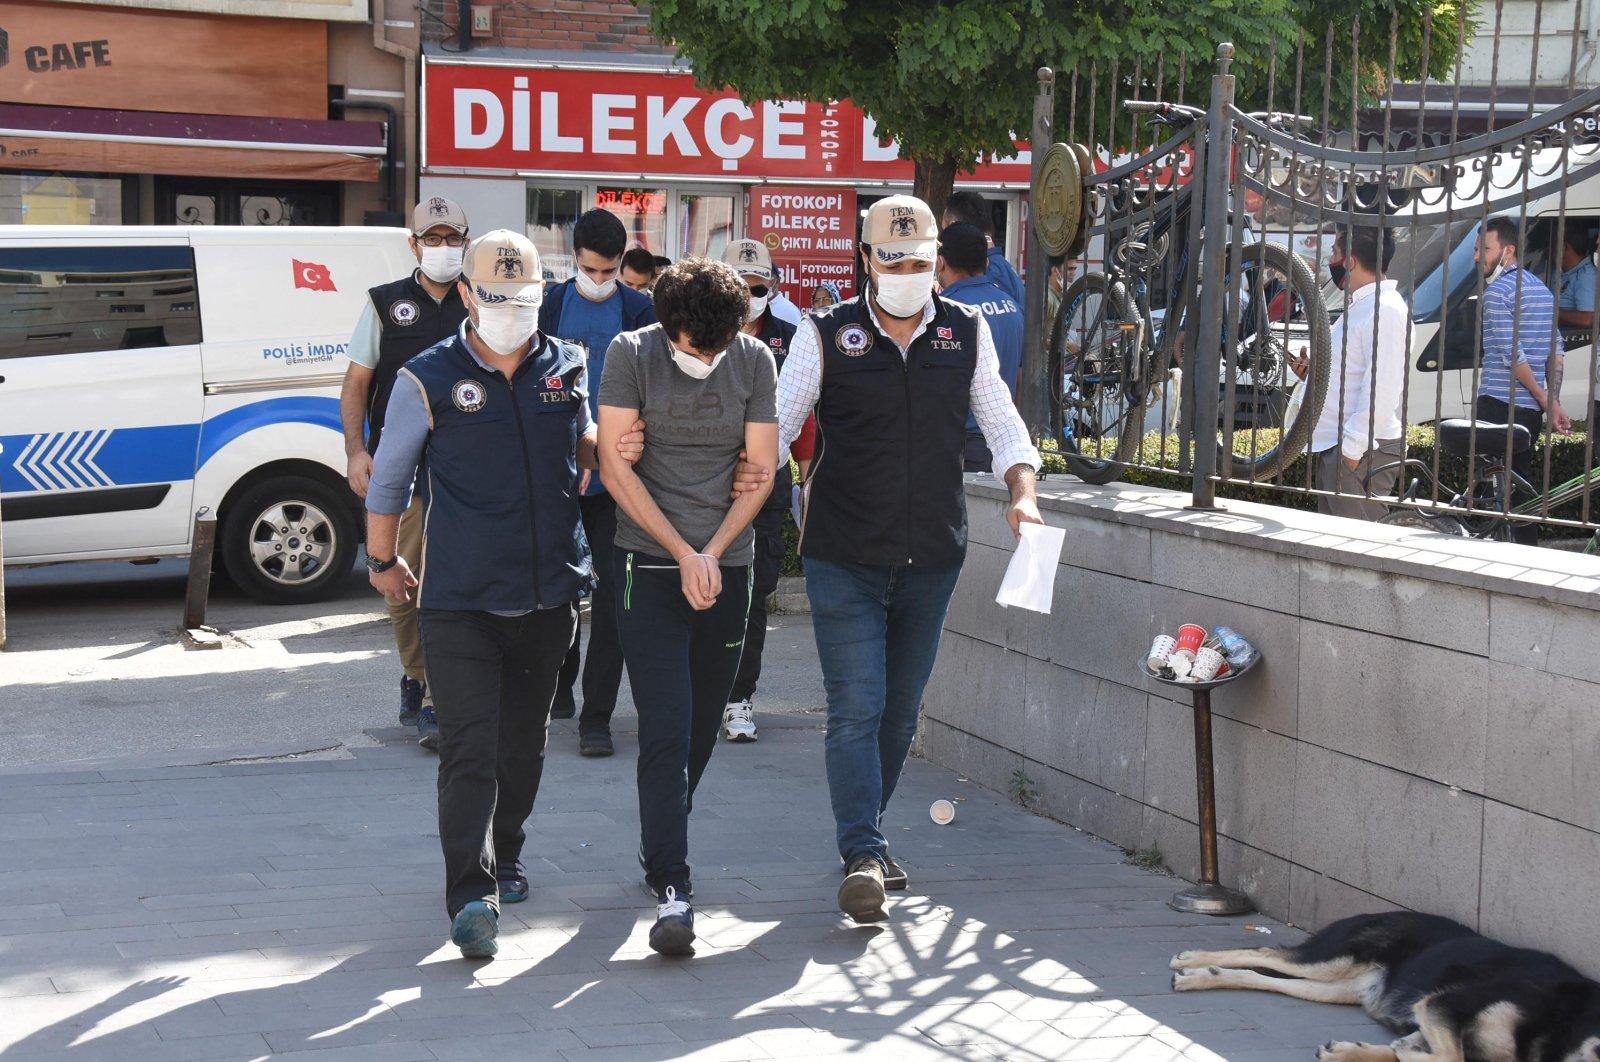 Police escort a FETÖ suspect captured in Eskişehir, central Turkey, Sept. 4, 2020. (DHA Photo)